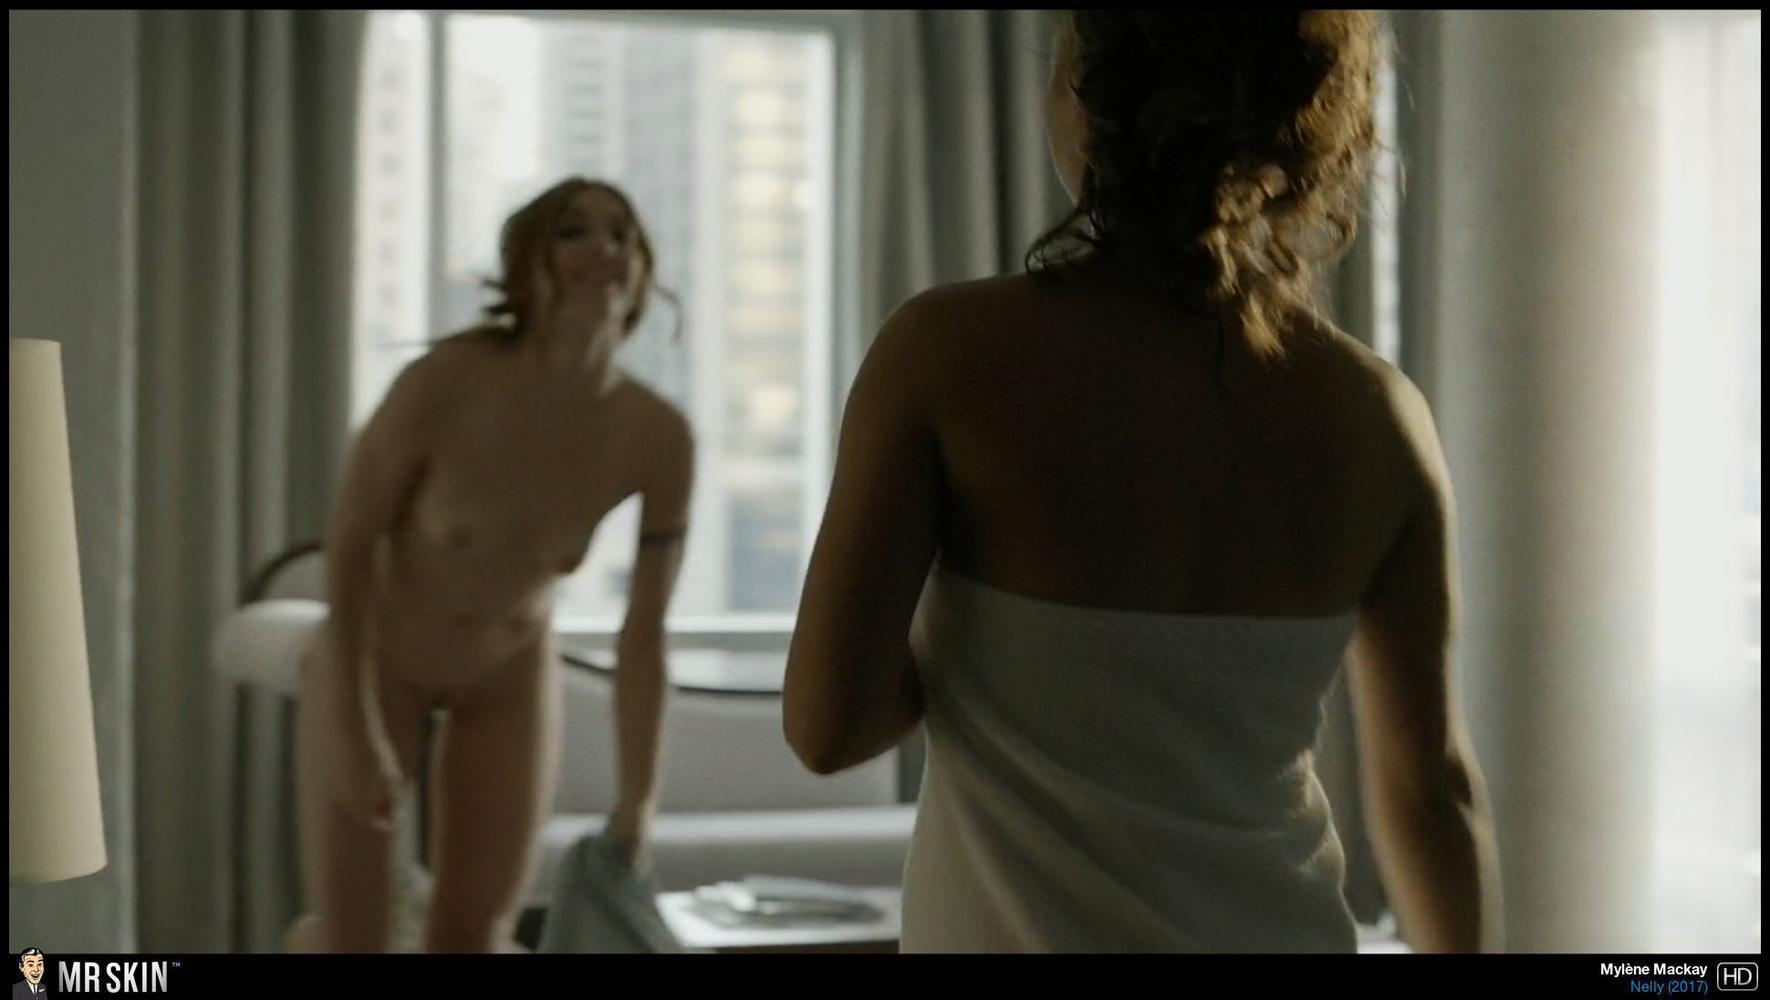 Aura Garrido Nude movie nudity report: nelly & cold skin 9.7.18